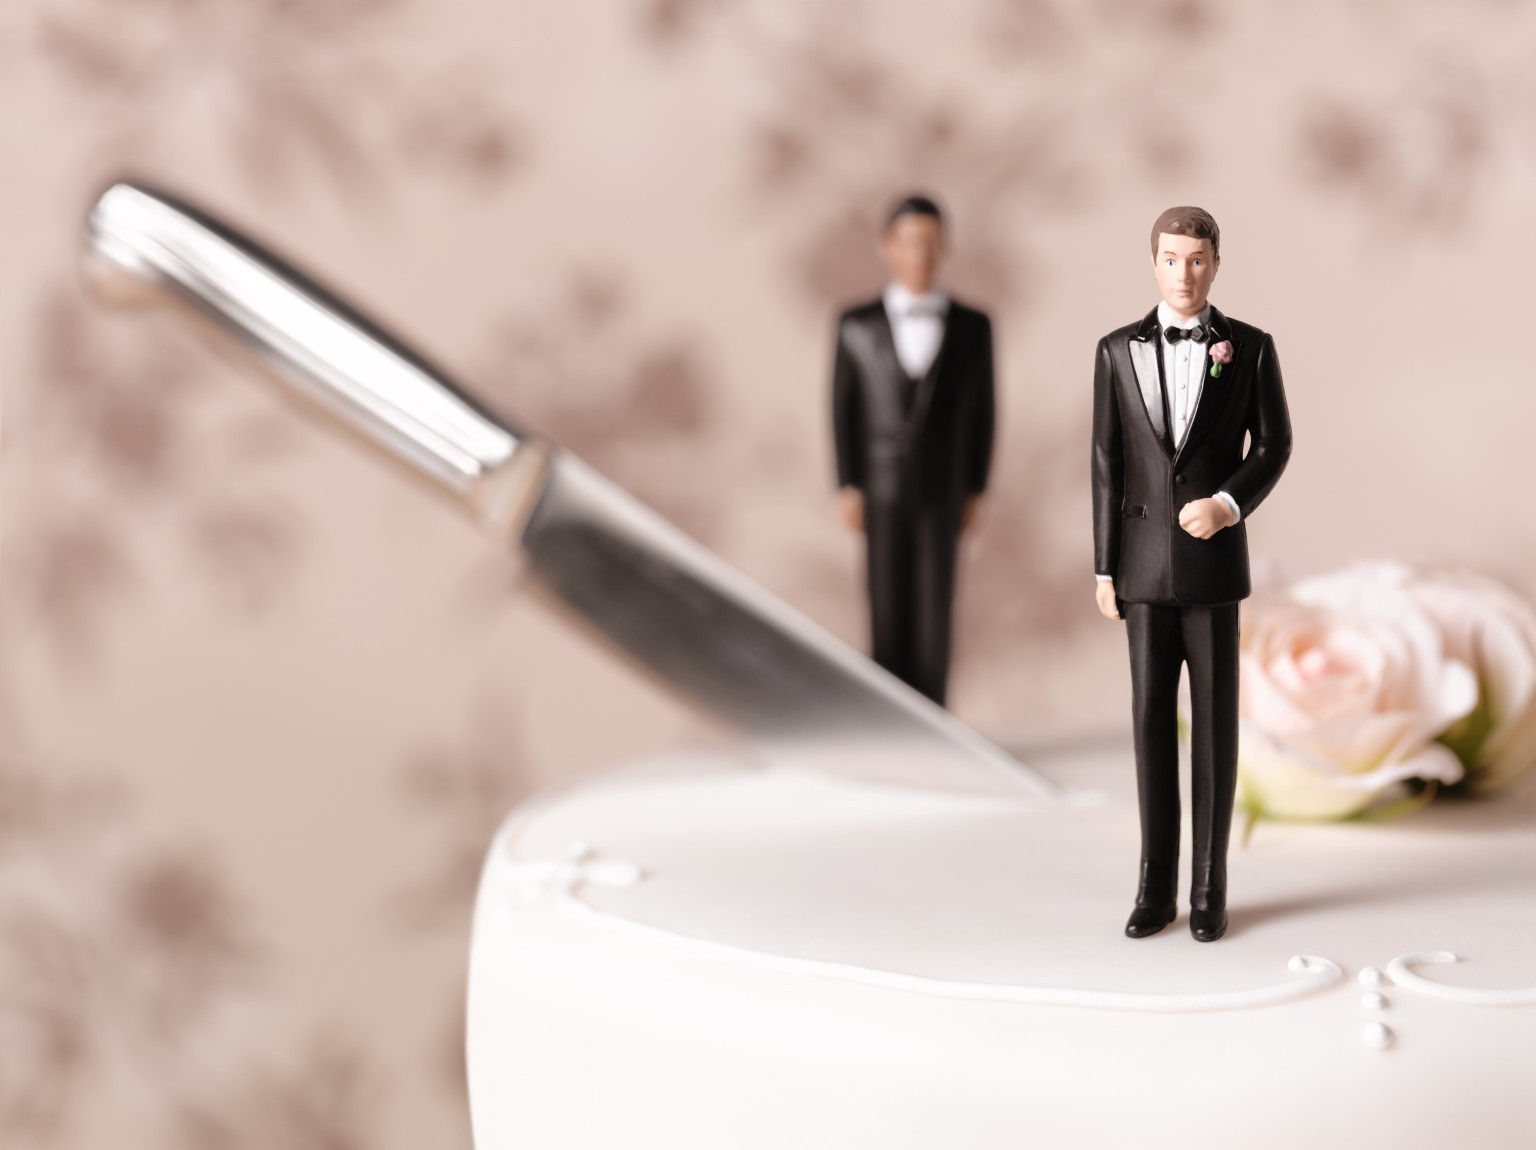 Same Sex wedding cake, cut in half